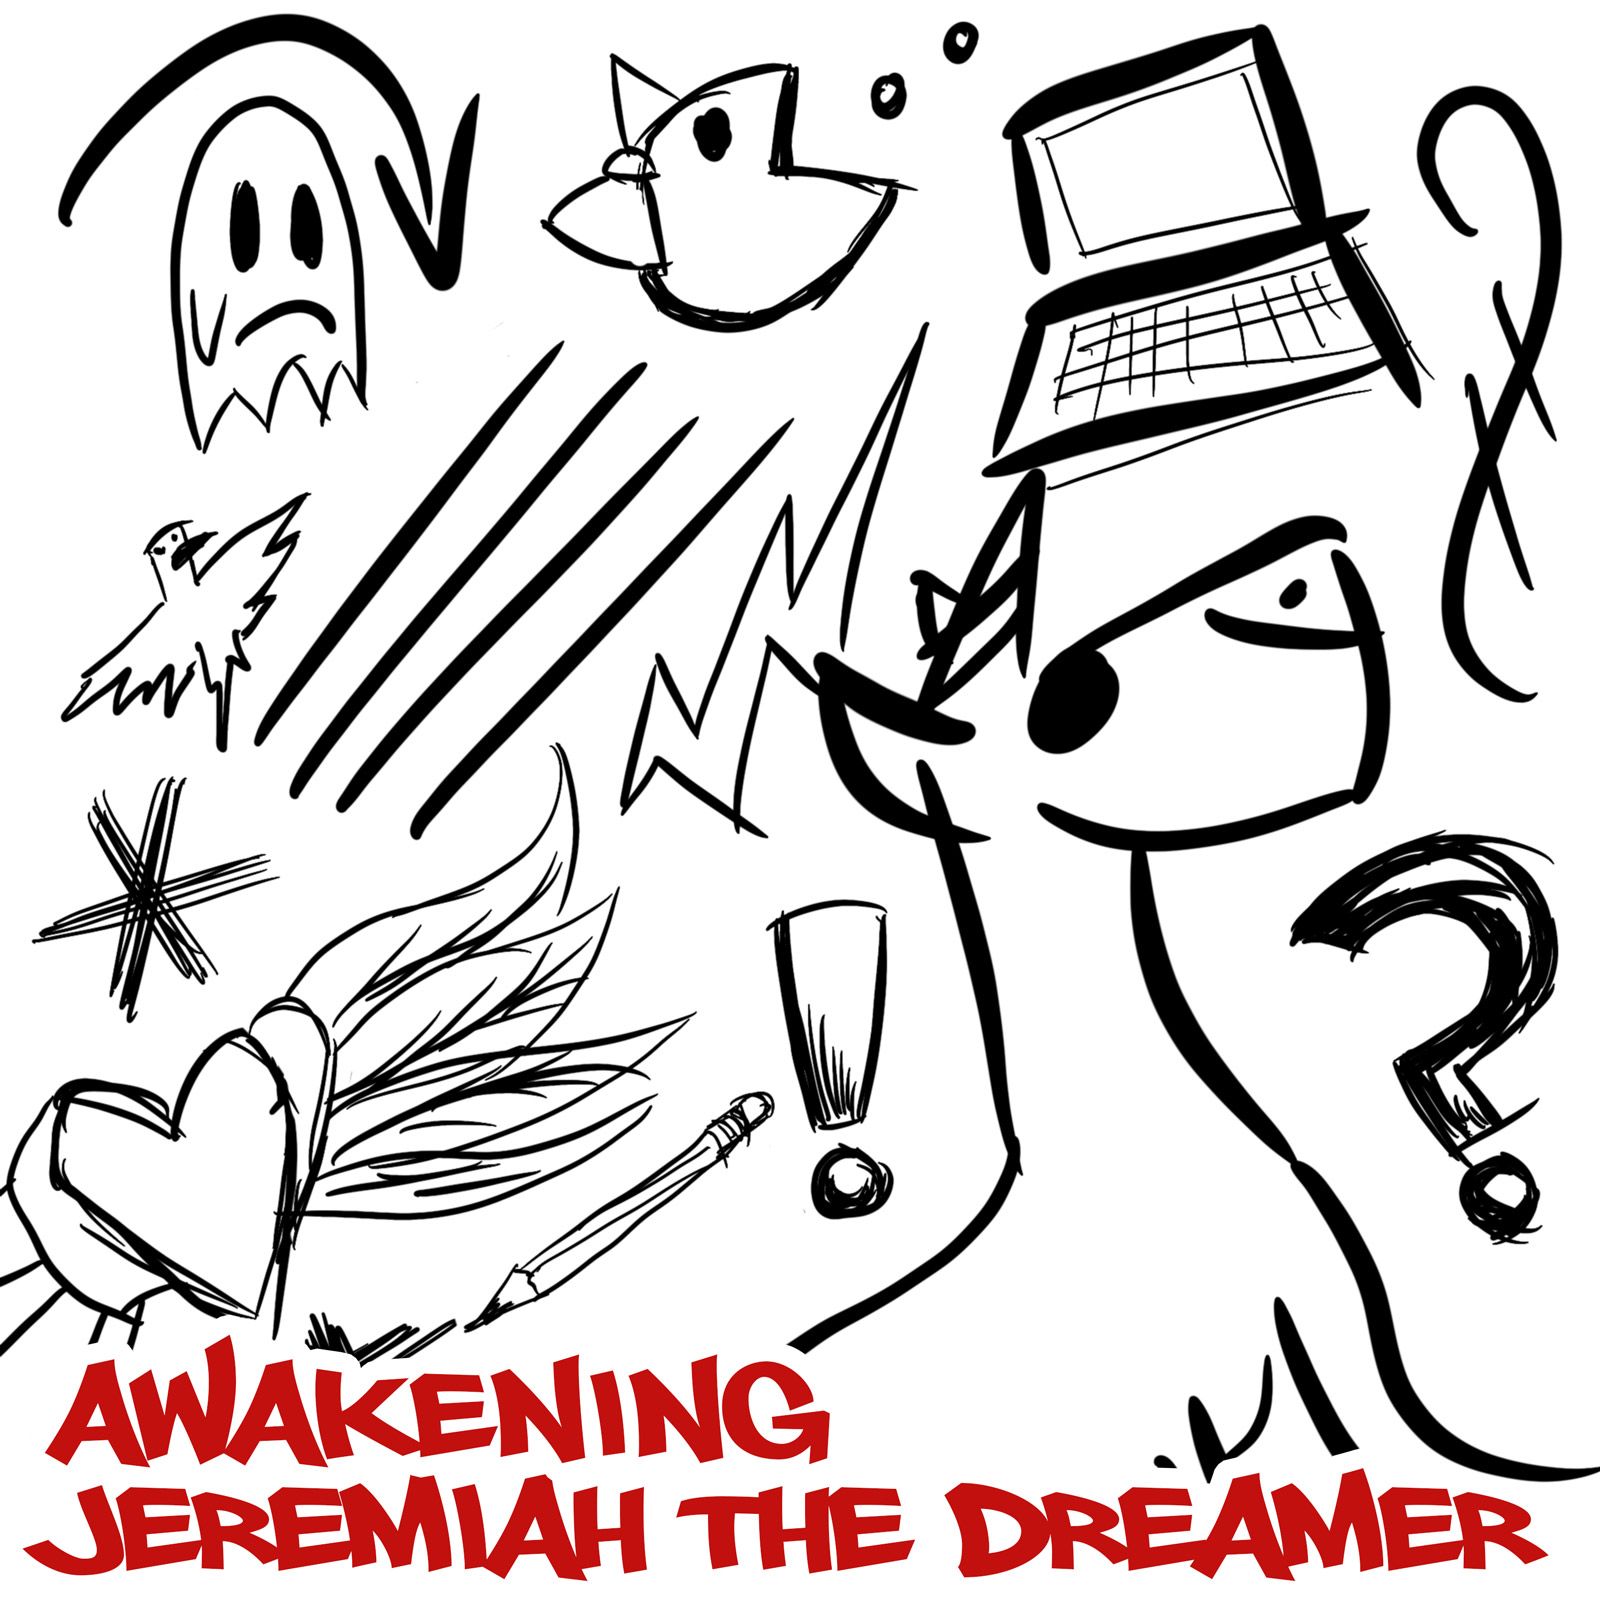 Awakening by Jeremiah the Dreamer